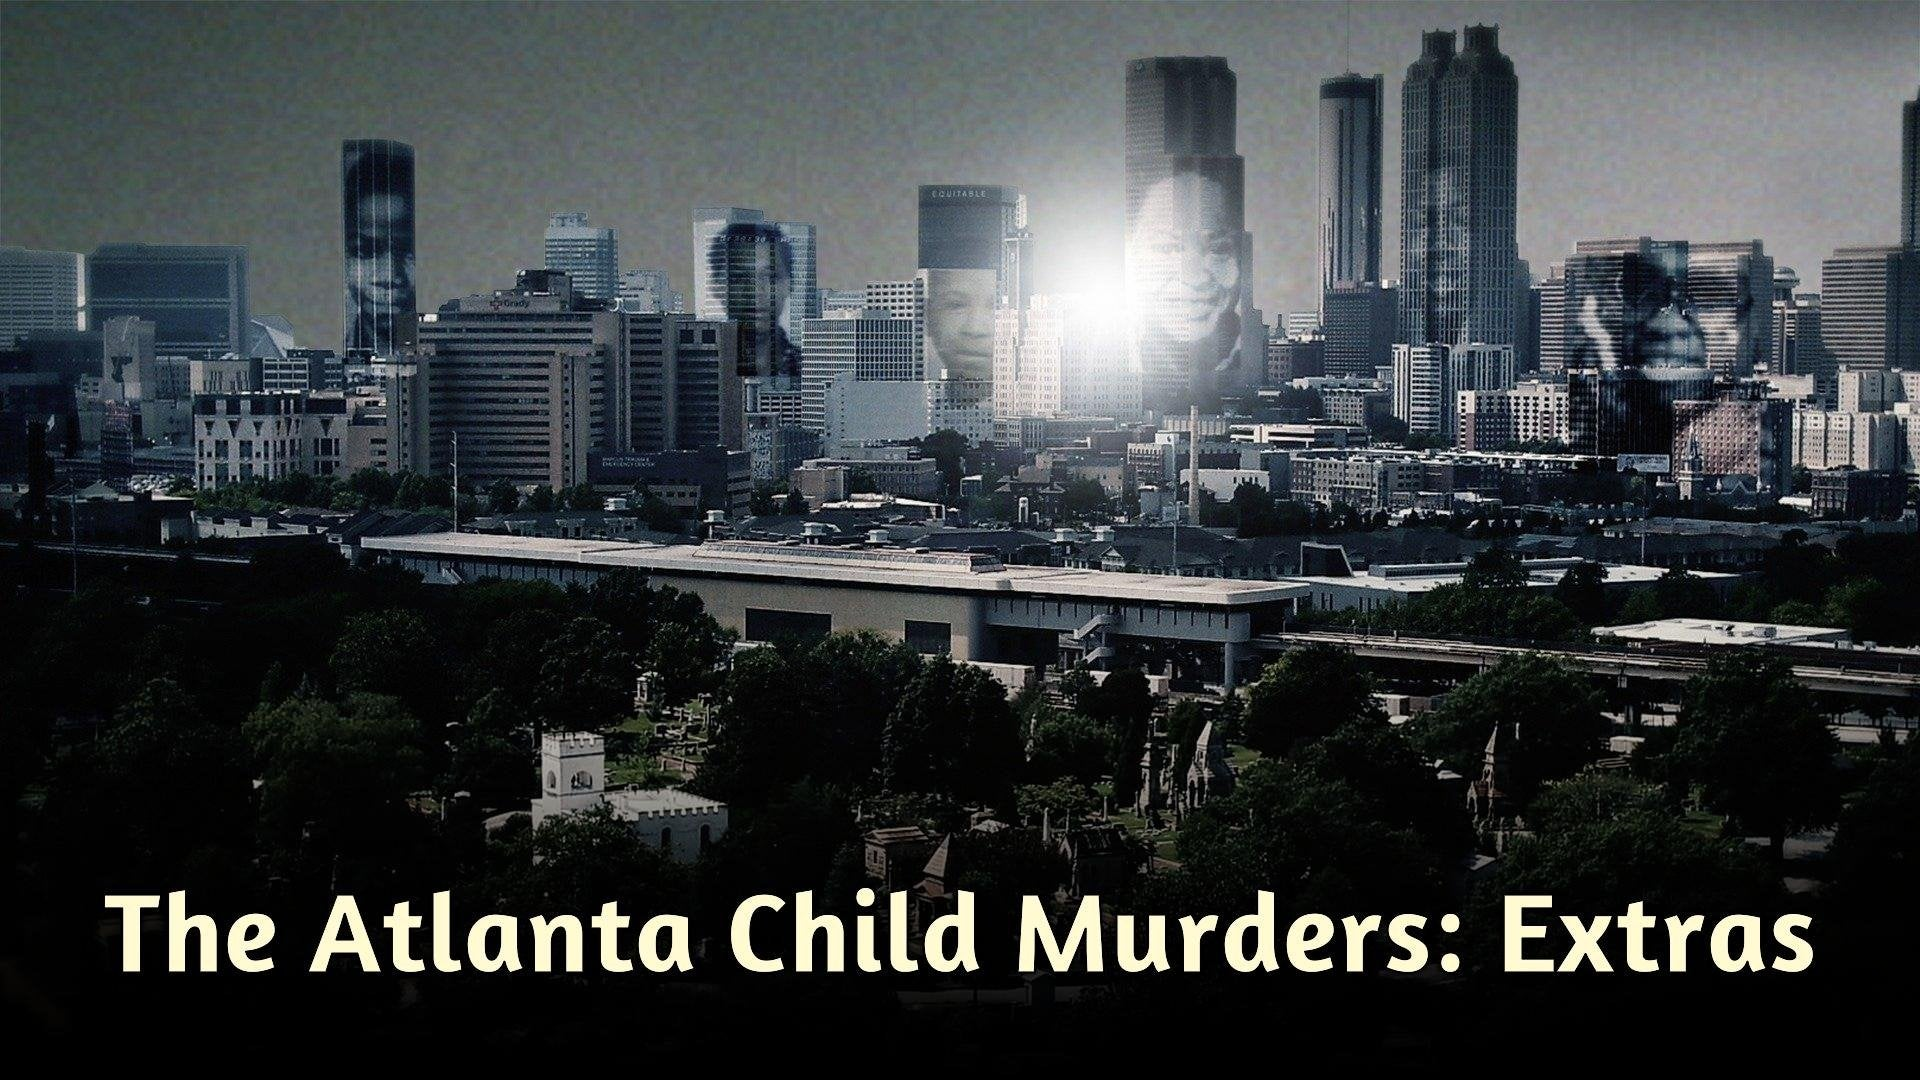 The Atlanta Child Murders: Extras